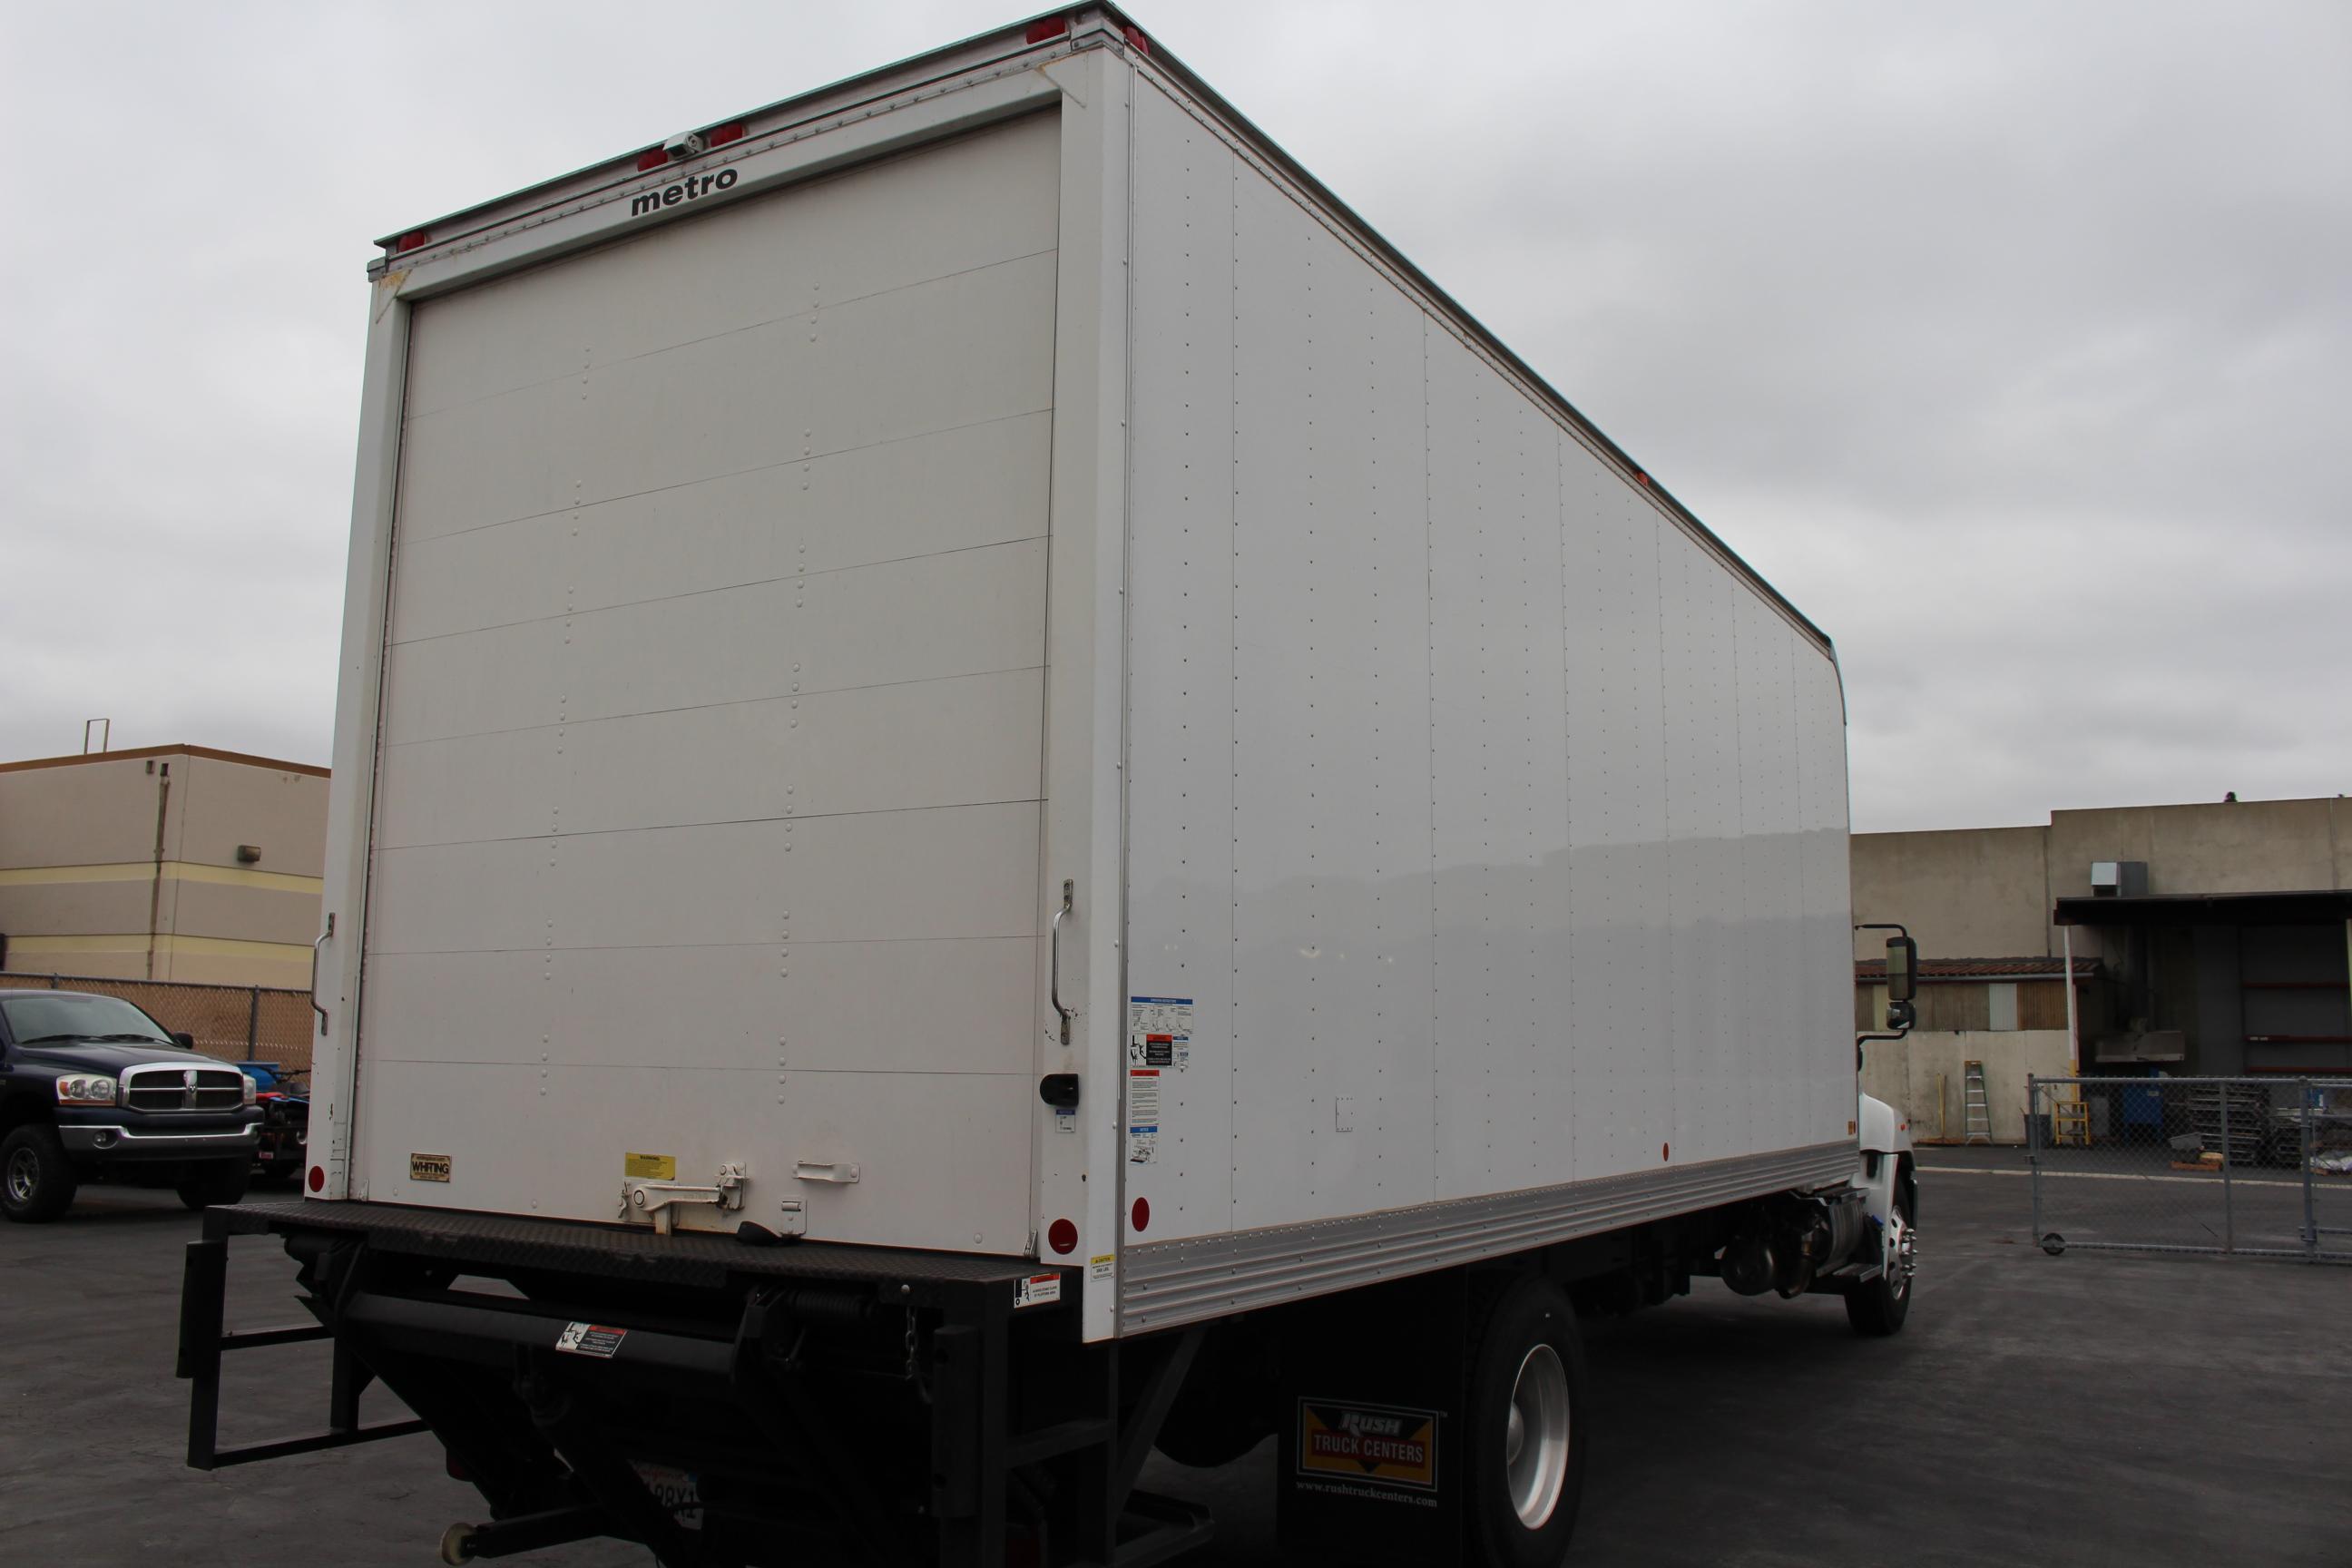 Lot 1 - 2016 HINO BOX TRUCK, MODEL 268, CONVENTIONAL CAB, METRO 25' BOX, LIFT GATE, 7.6L L6 DIESEL ENGINE,